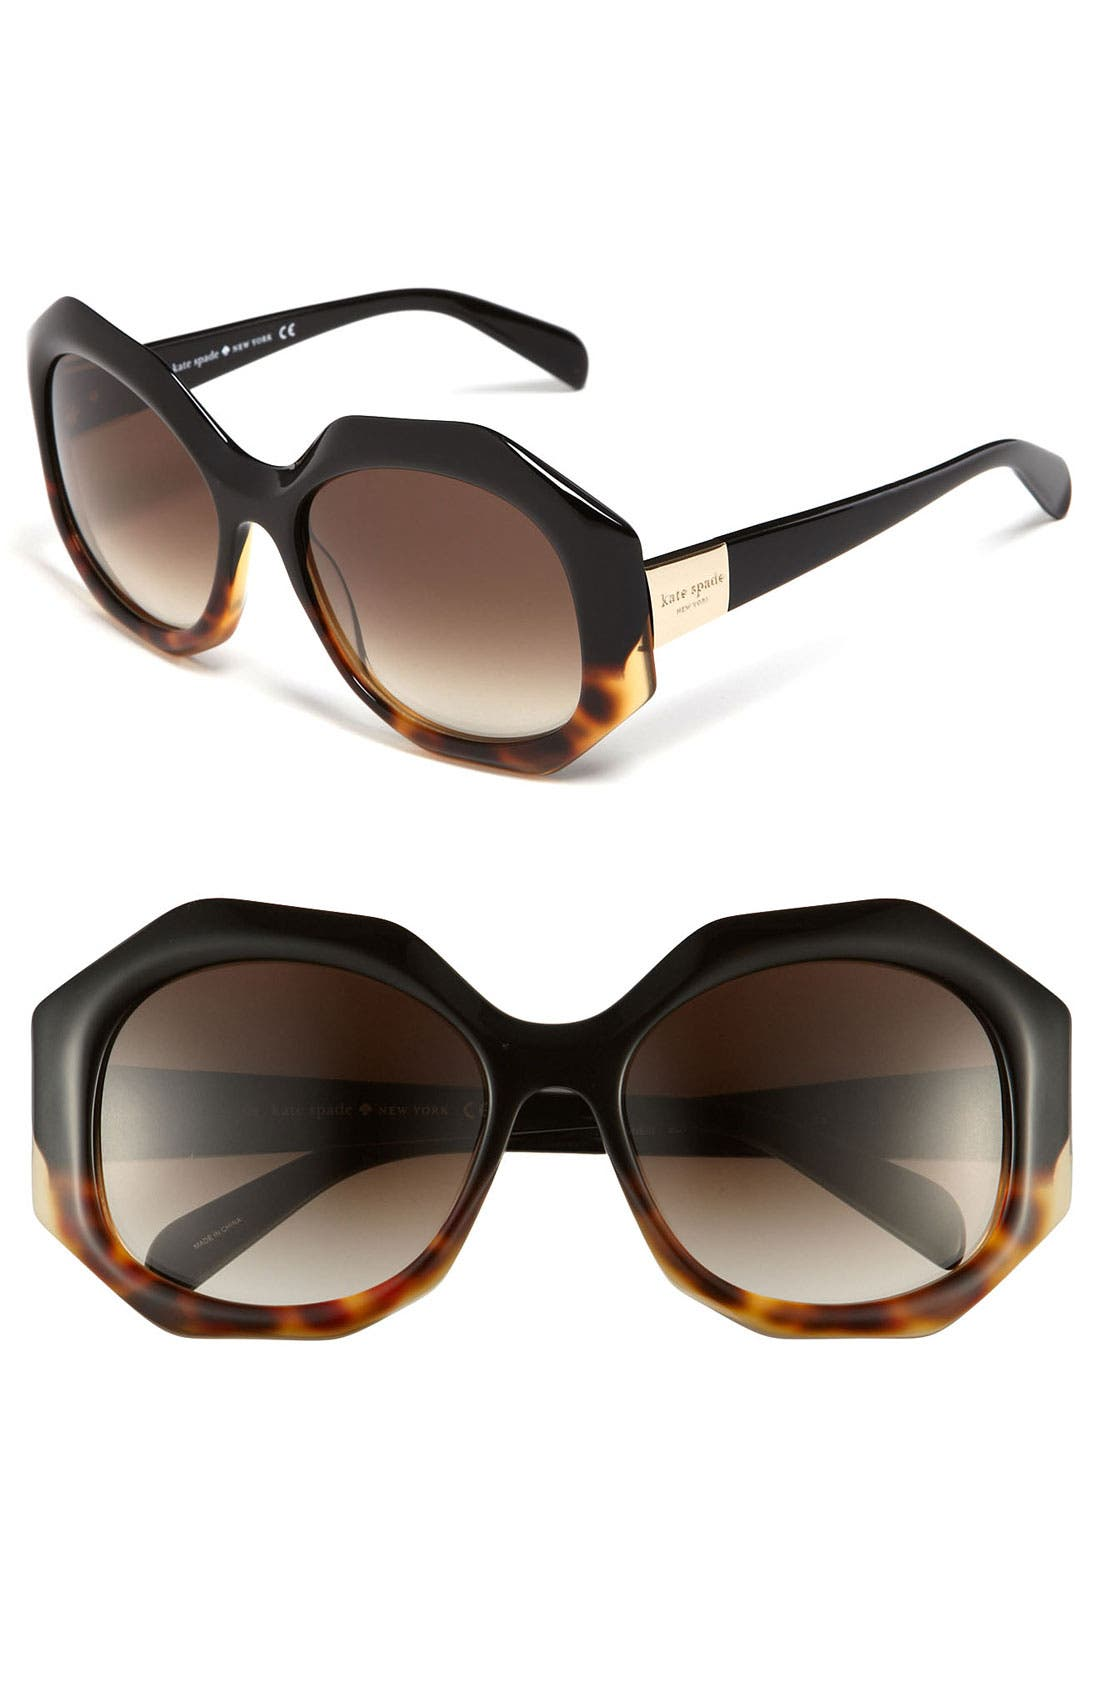 Main Image - kate spade new york Oversized retro sunglasses